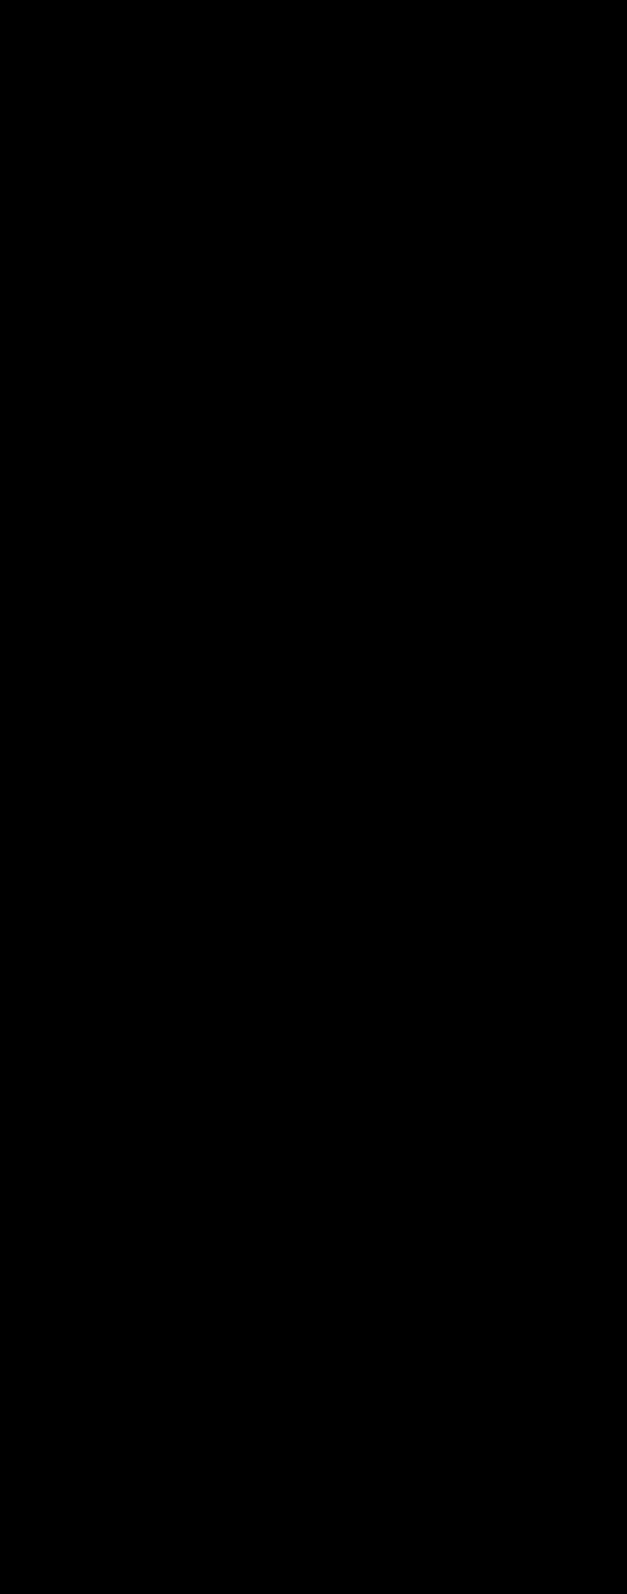 image124.png